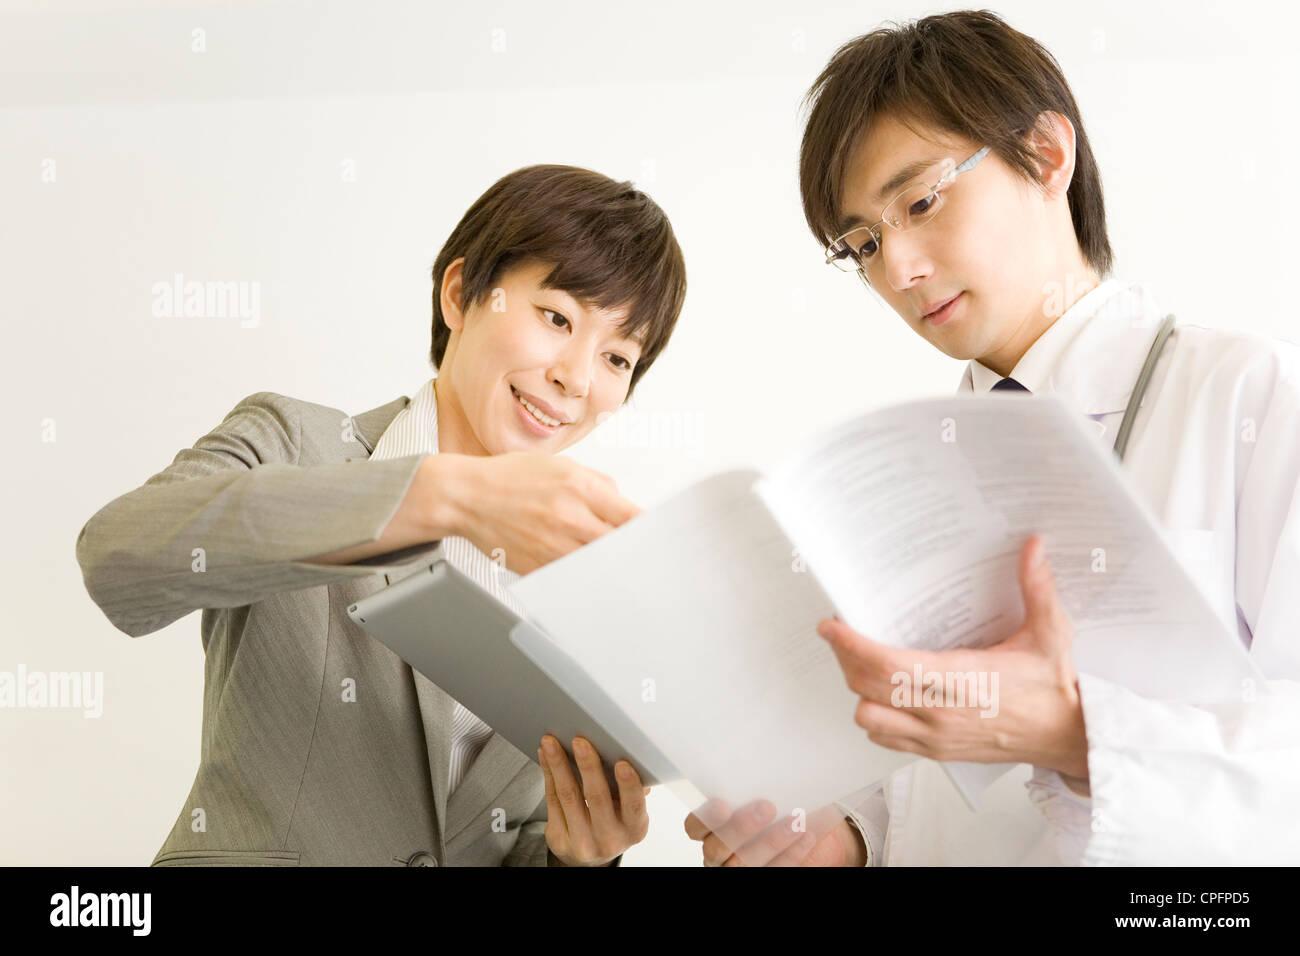 pharmaceutical s representative showing file to doctor stock pharmaceutical s representative showing file to doctor